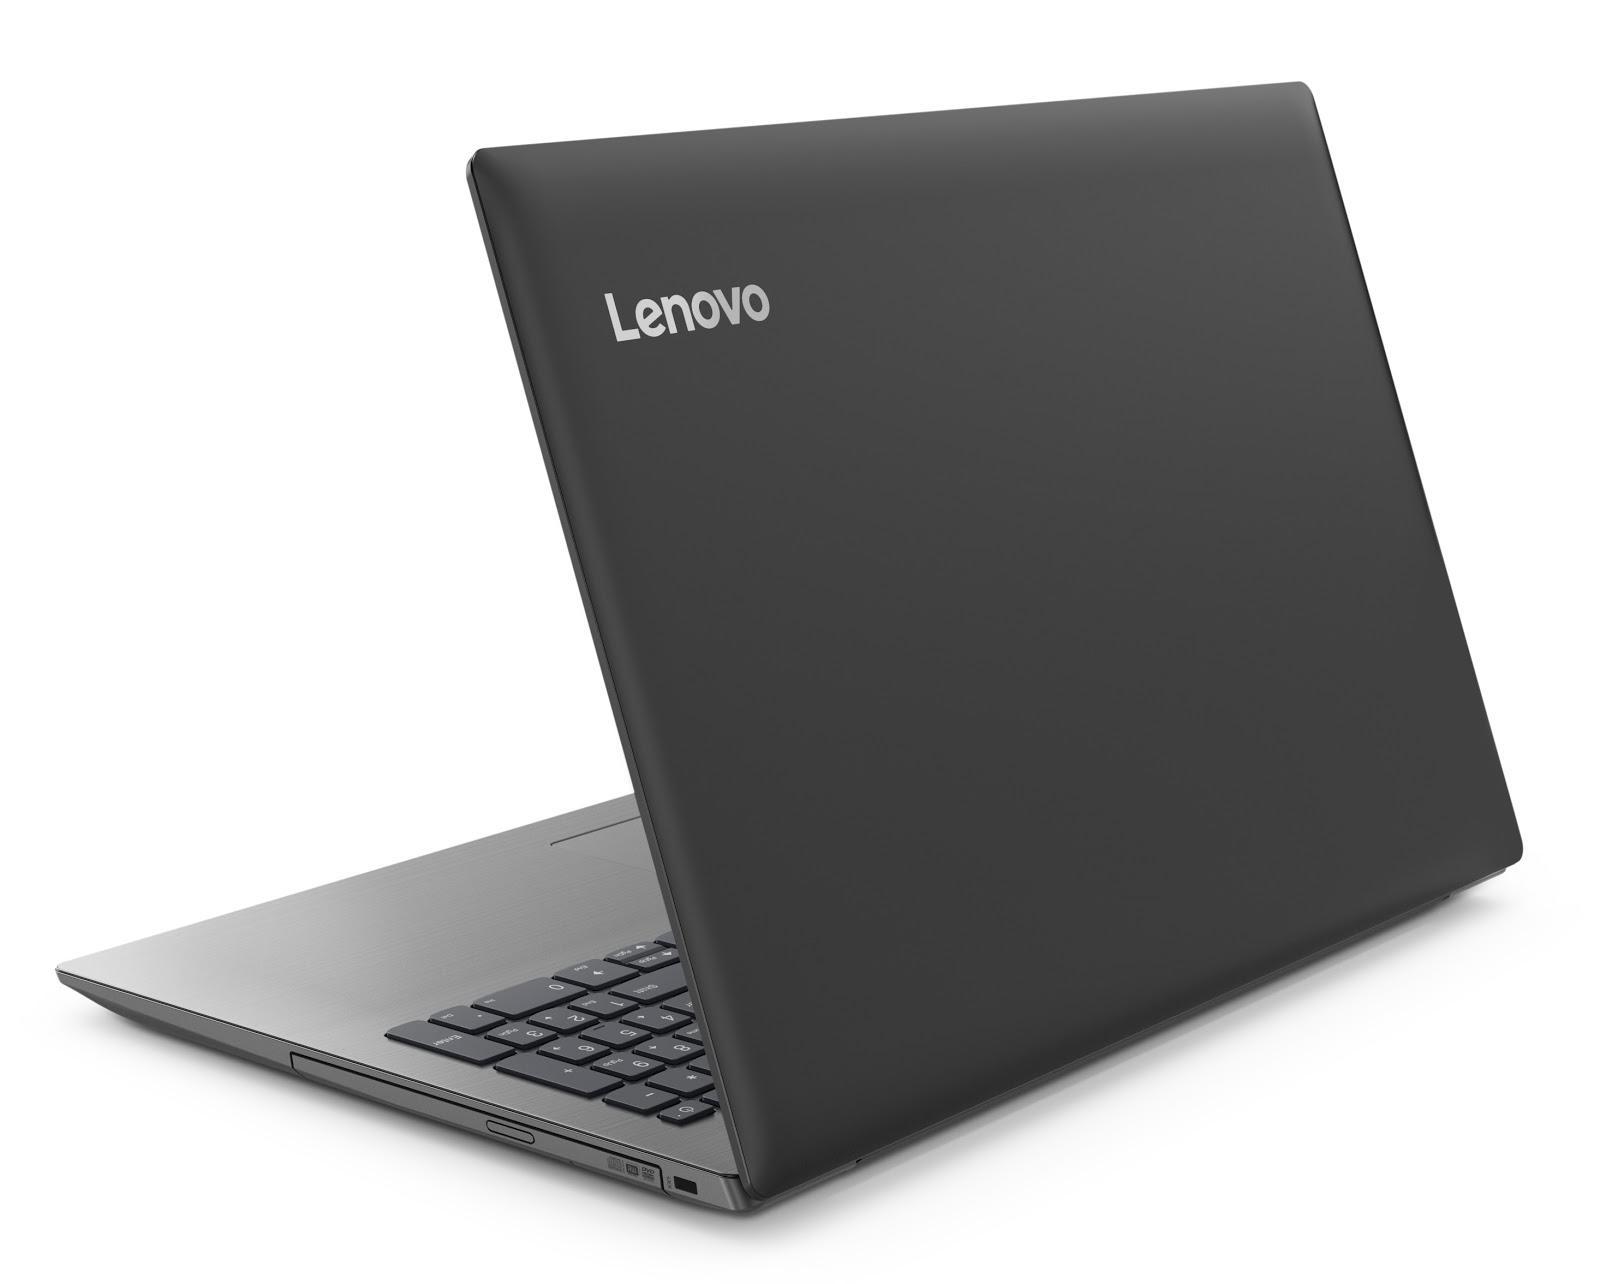 Фото 1. Ноутбук Lenovo ideapad 330-15 Onyx Black (81DE01VSRA)